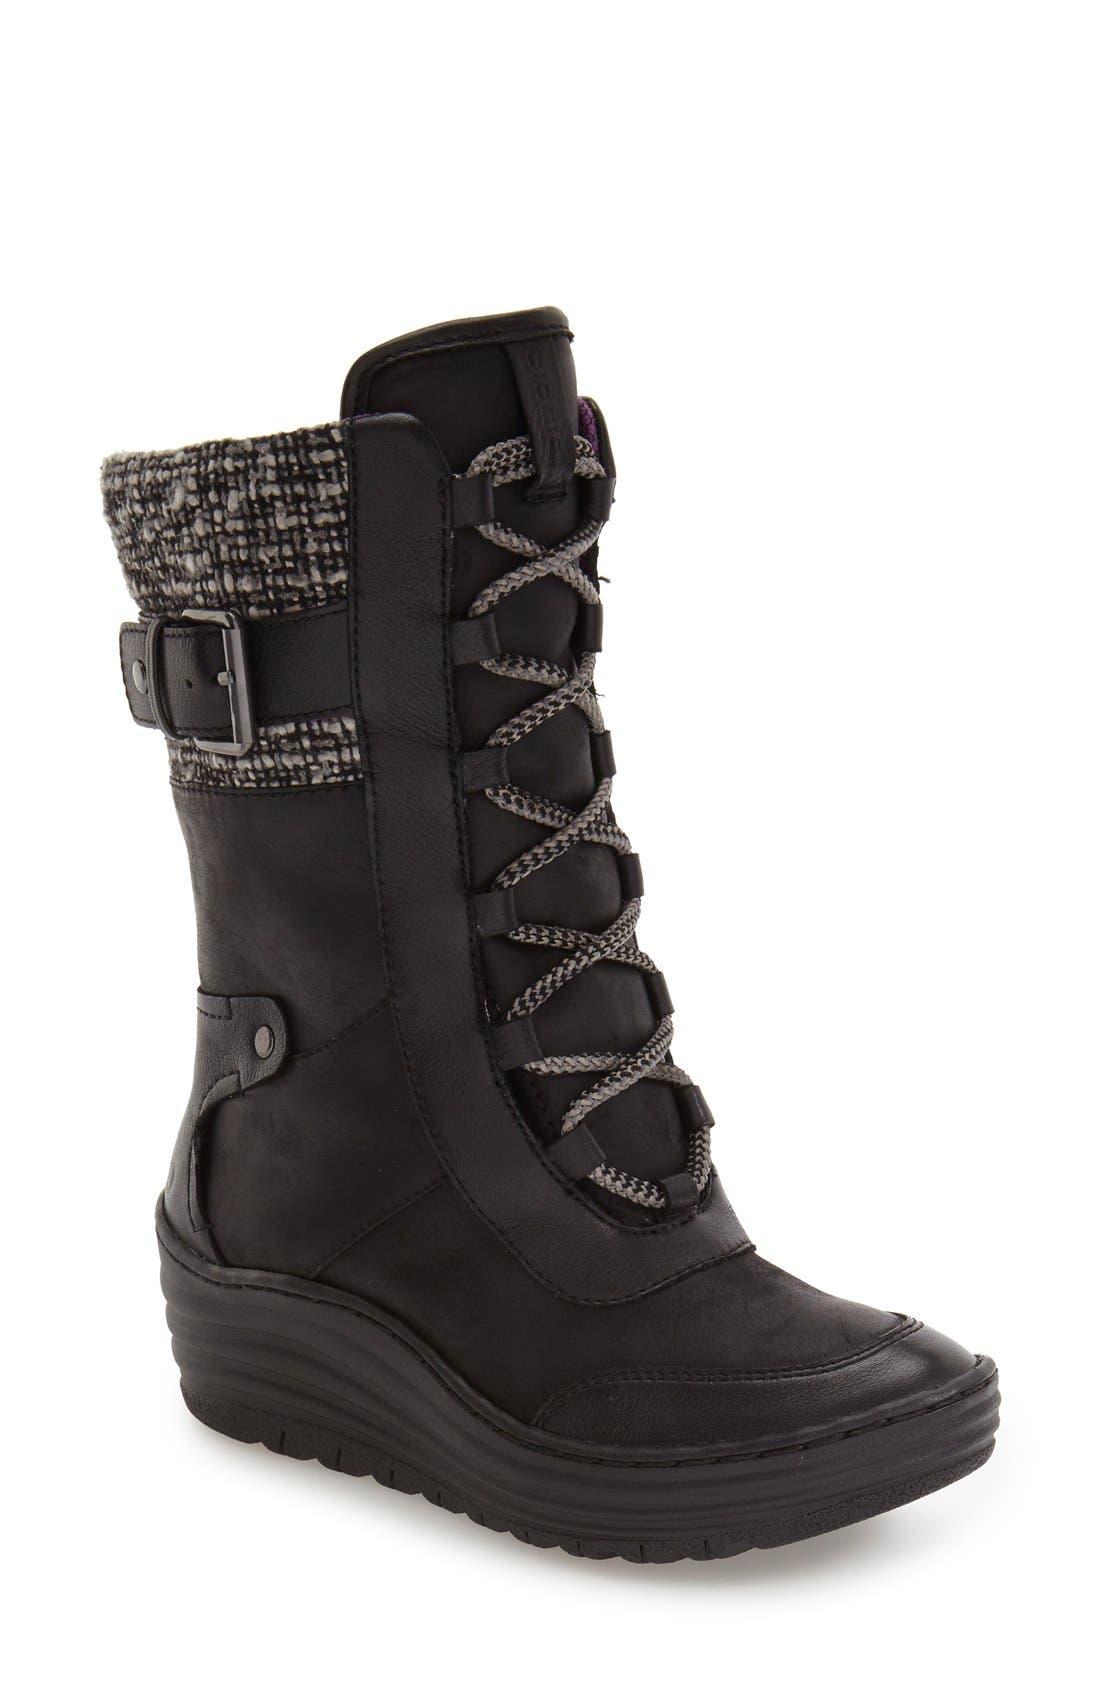 Garland Waterproof Wedge Boot,                             Main thumbnail 1, color,                             Black Waterproof Leather